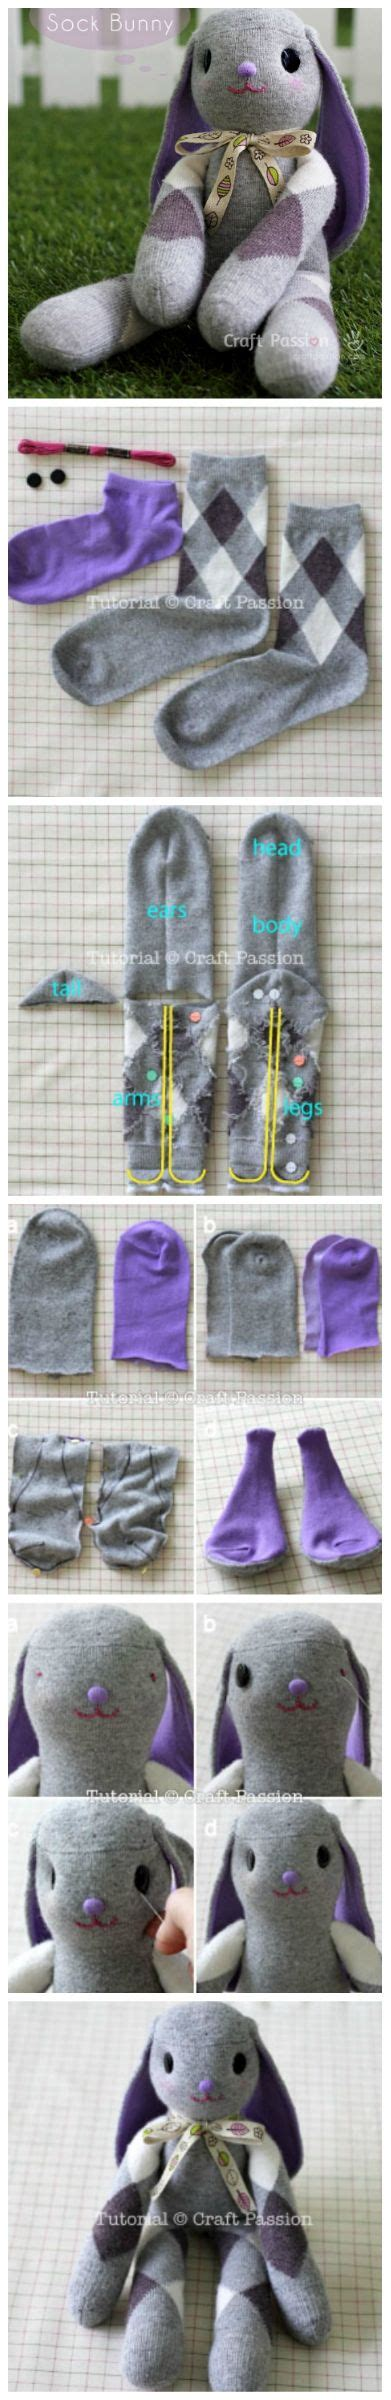 diy adorable sock diy adorable sock bunny sewing sock animals